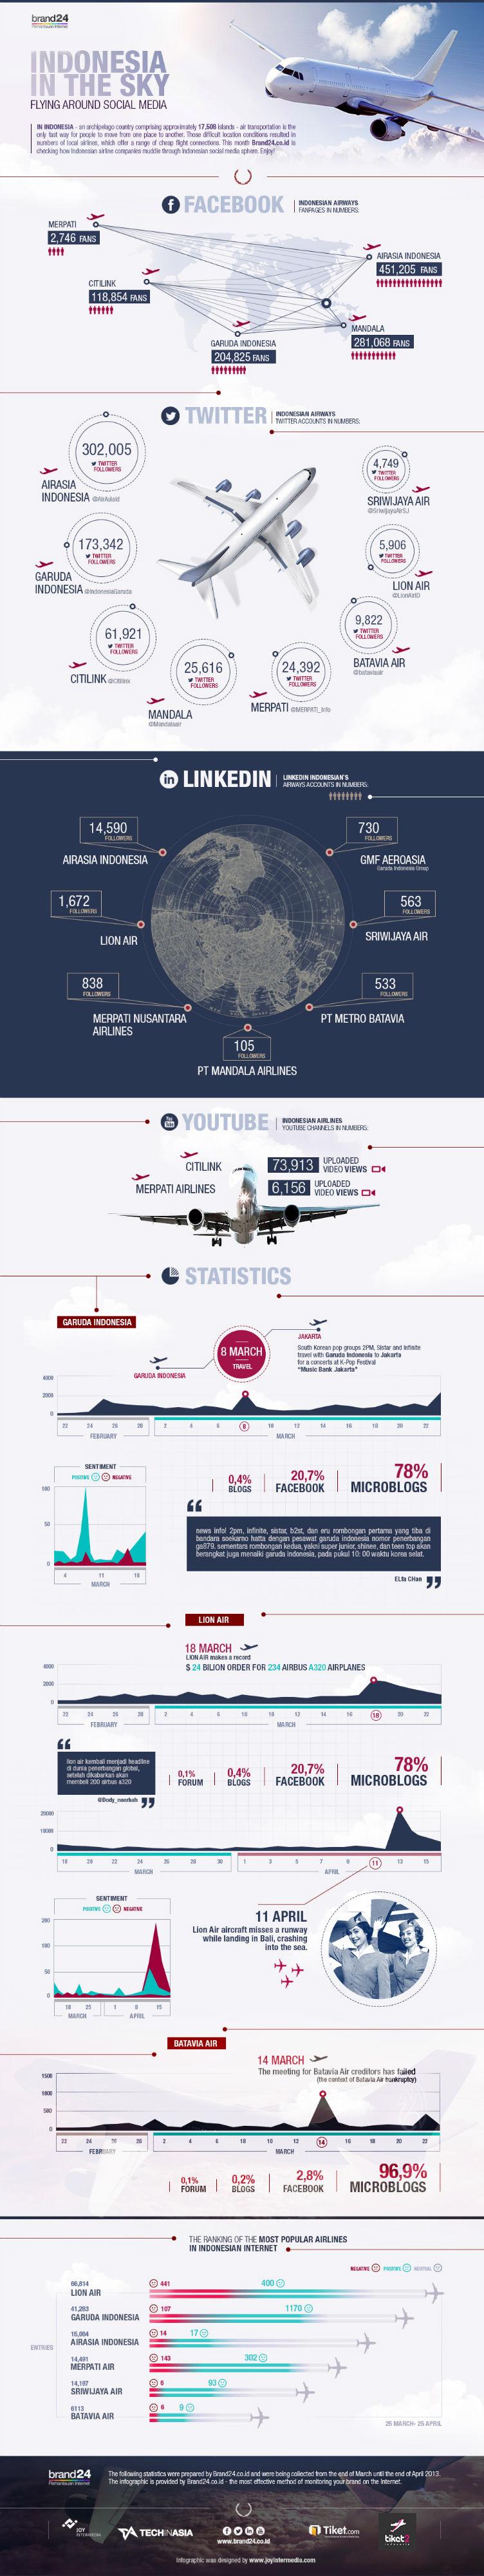 indonesia-in-the-sky-flying-around-social-media_51810589c3740